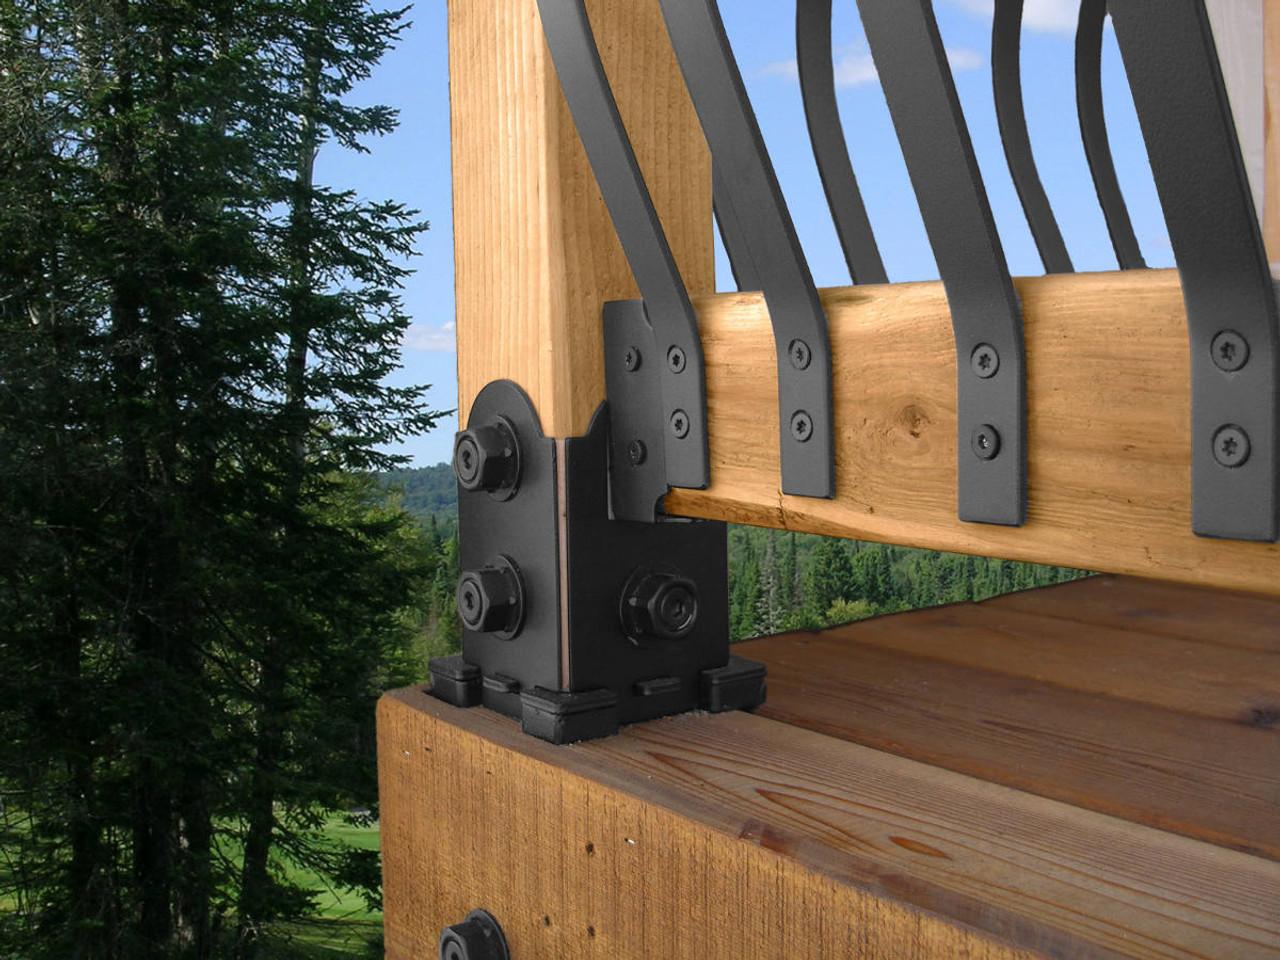 Deck Post & Rail Installed with OZCO Post Base w/ 2 Railing Saddles